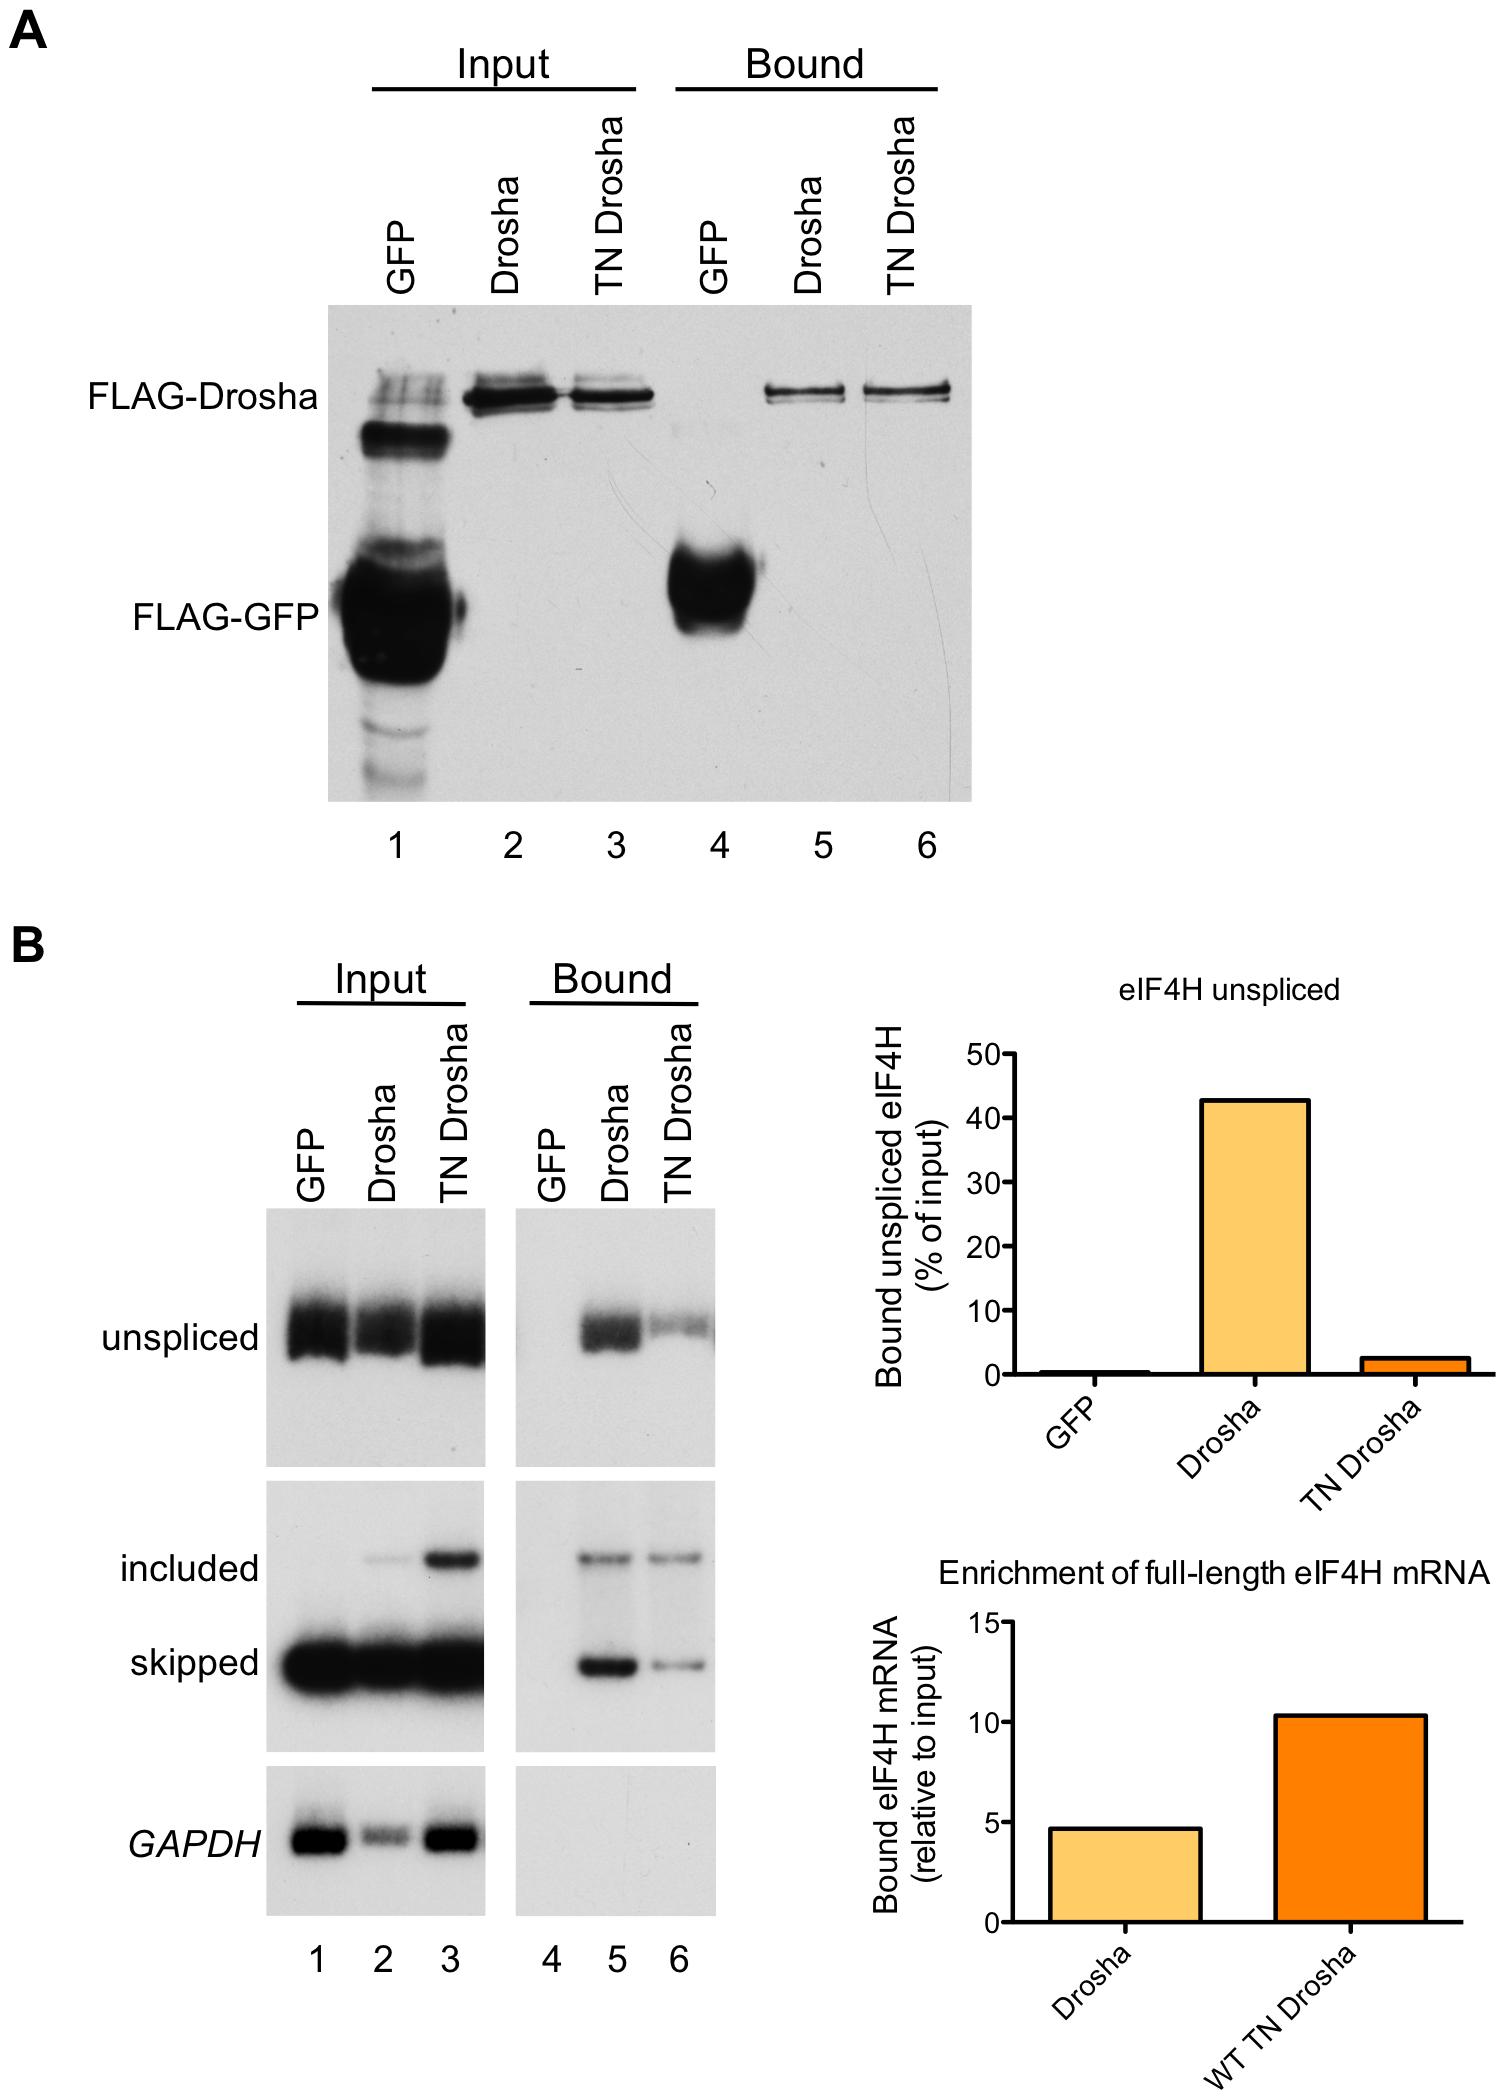 <i>eIF4H</i> exon 5 co-immunoprecipitates with Drosha and TN Drosha.